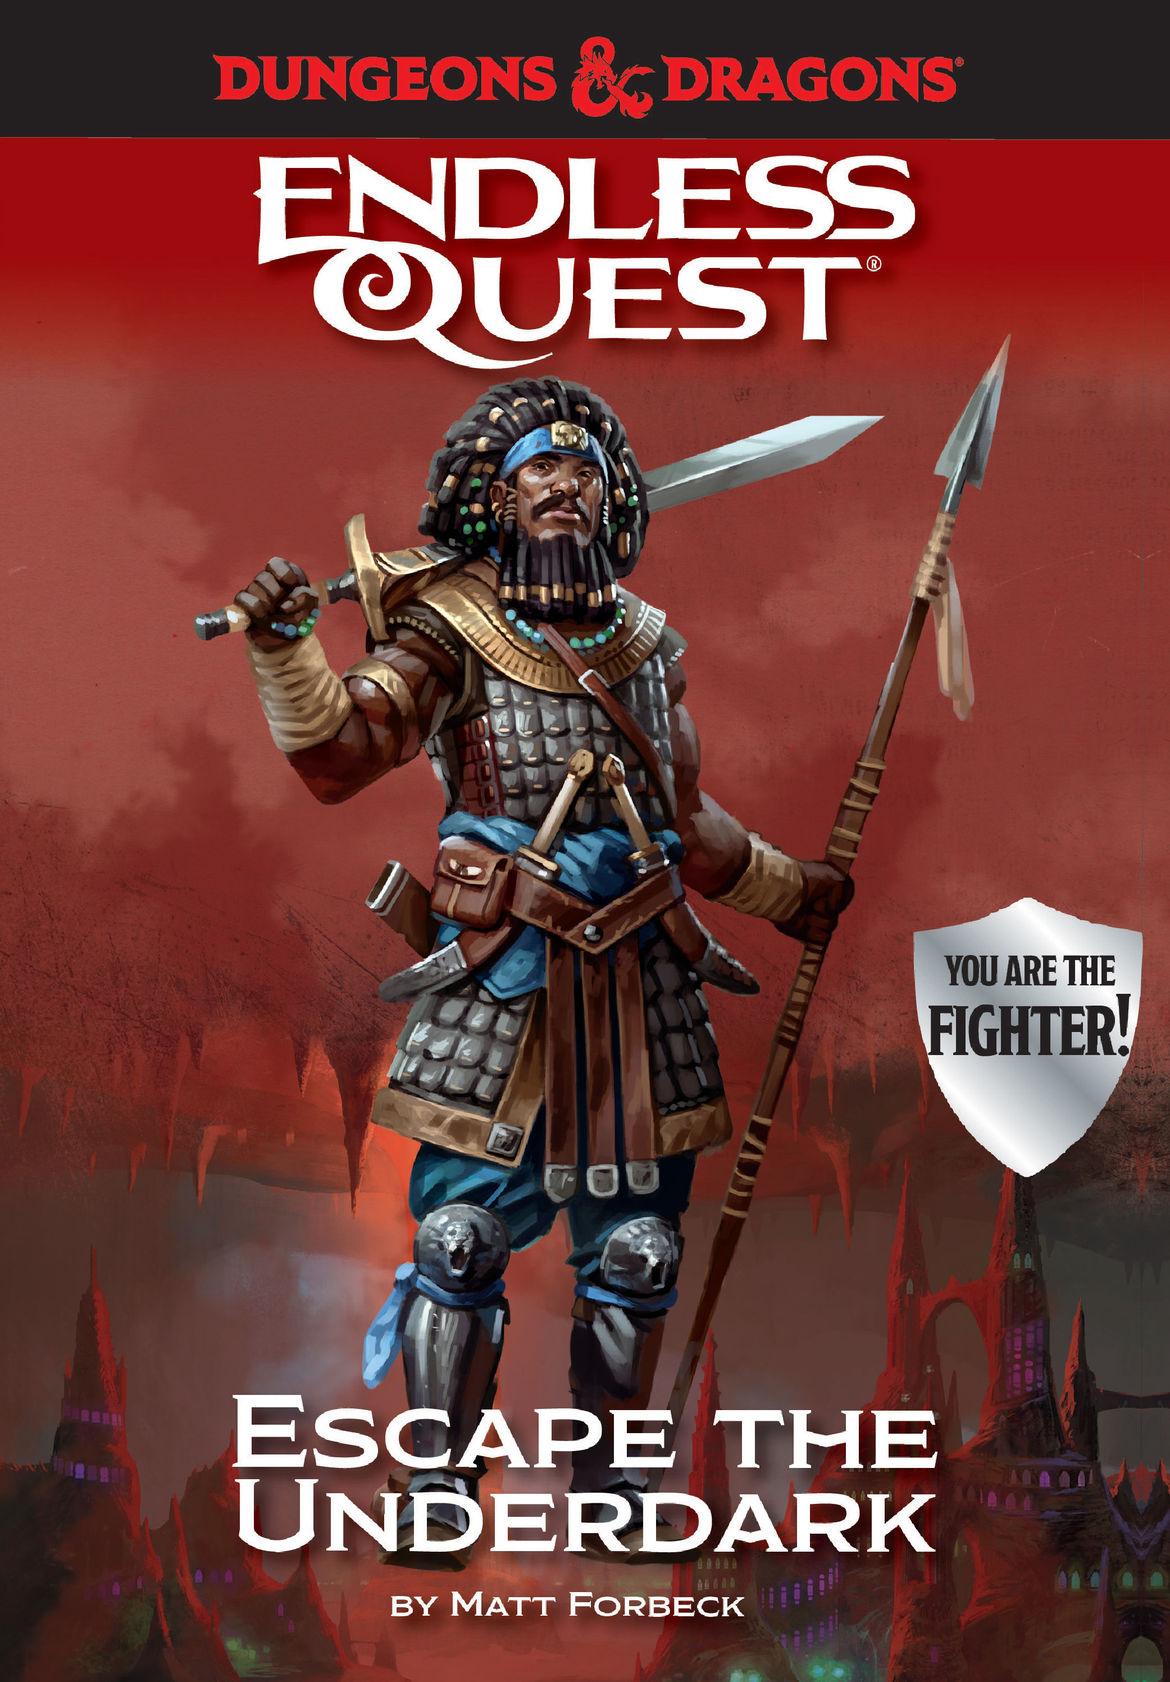 Dungeons & Dragons Endless Quest: Escape the Underdark